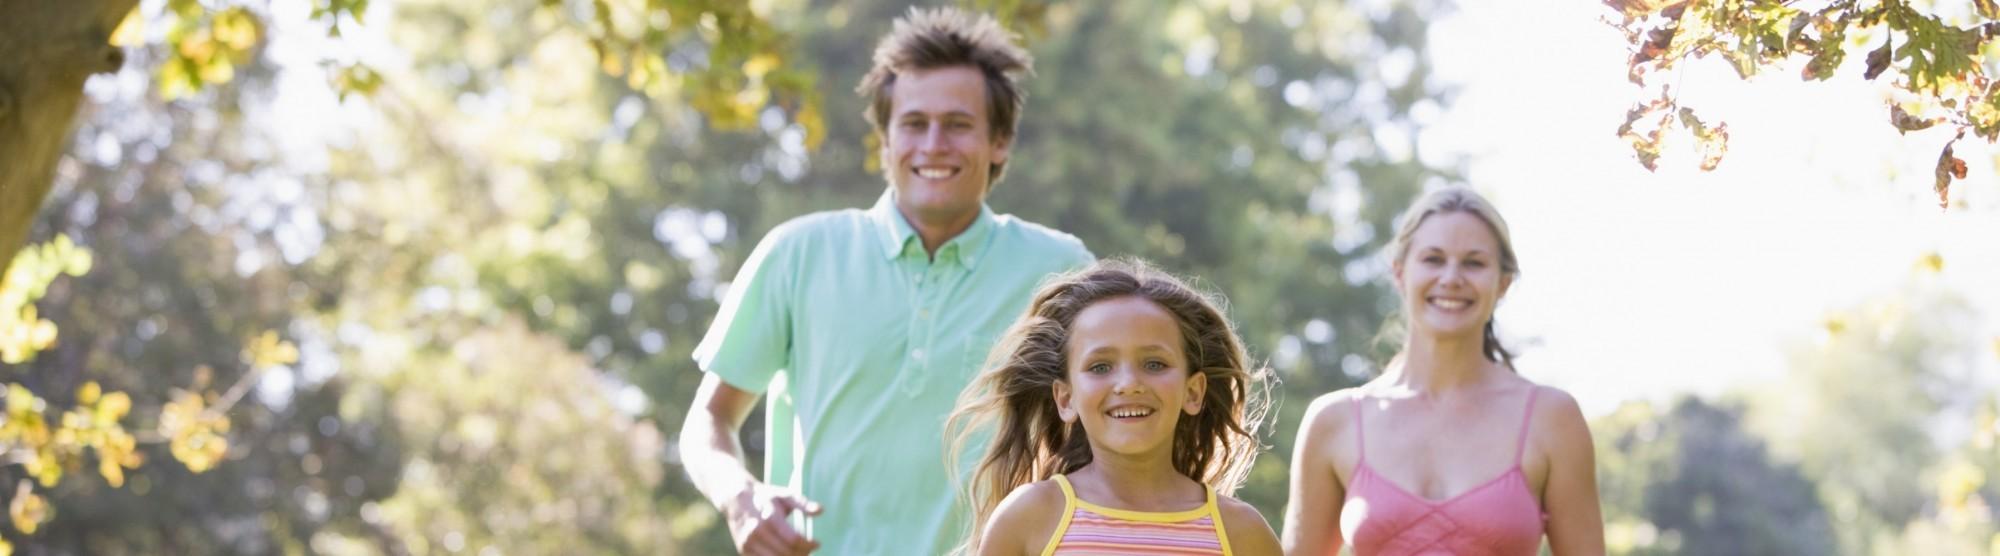 Healthier People, Happier Lives